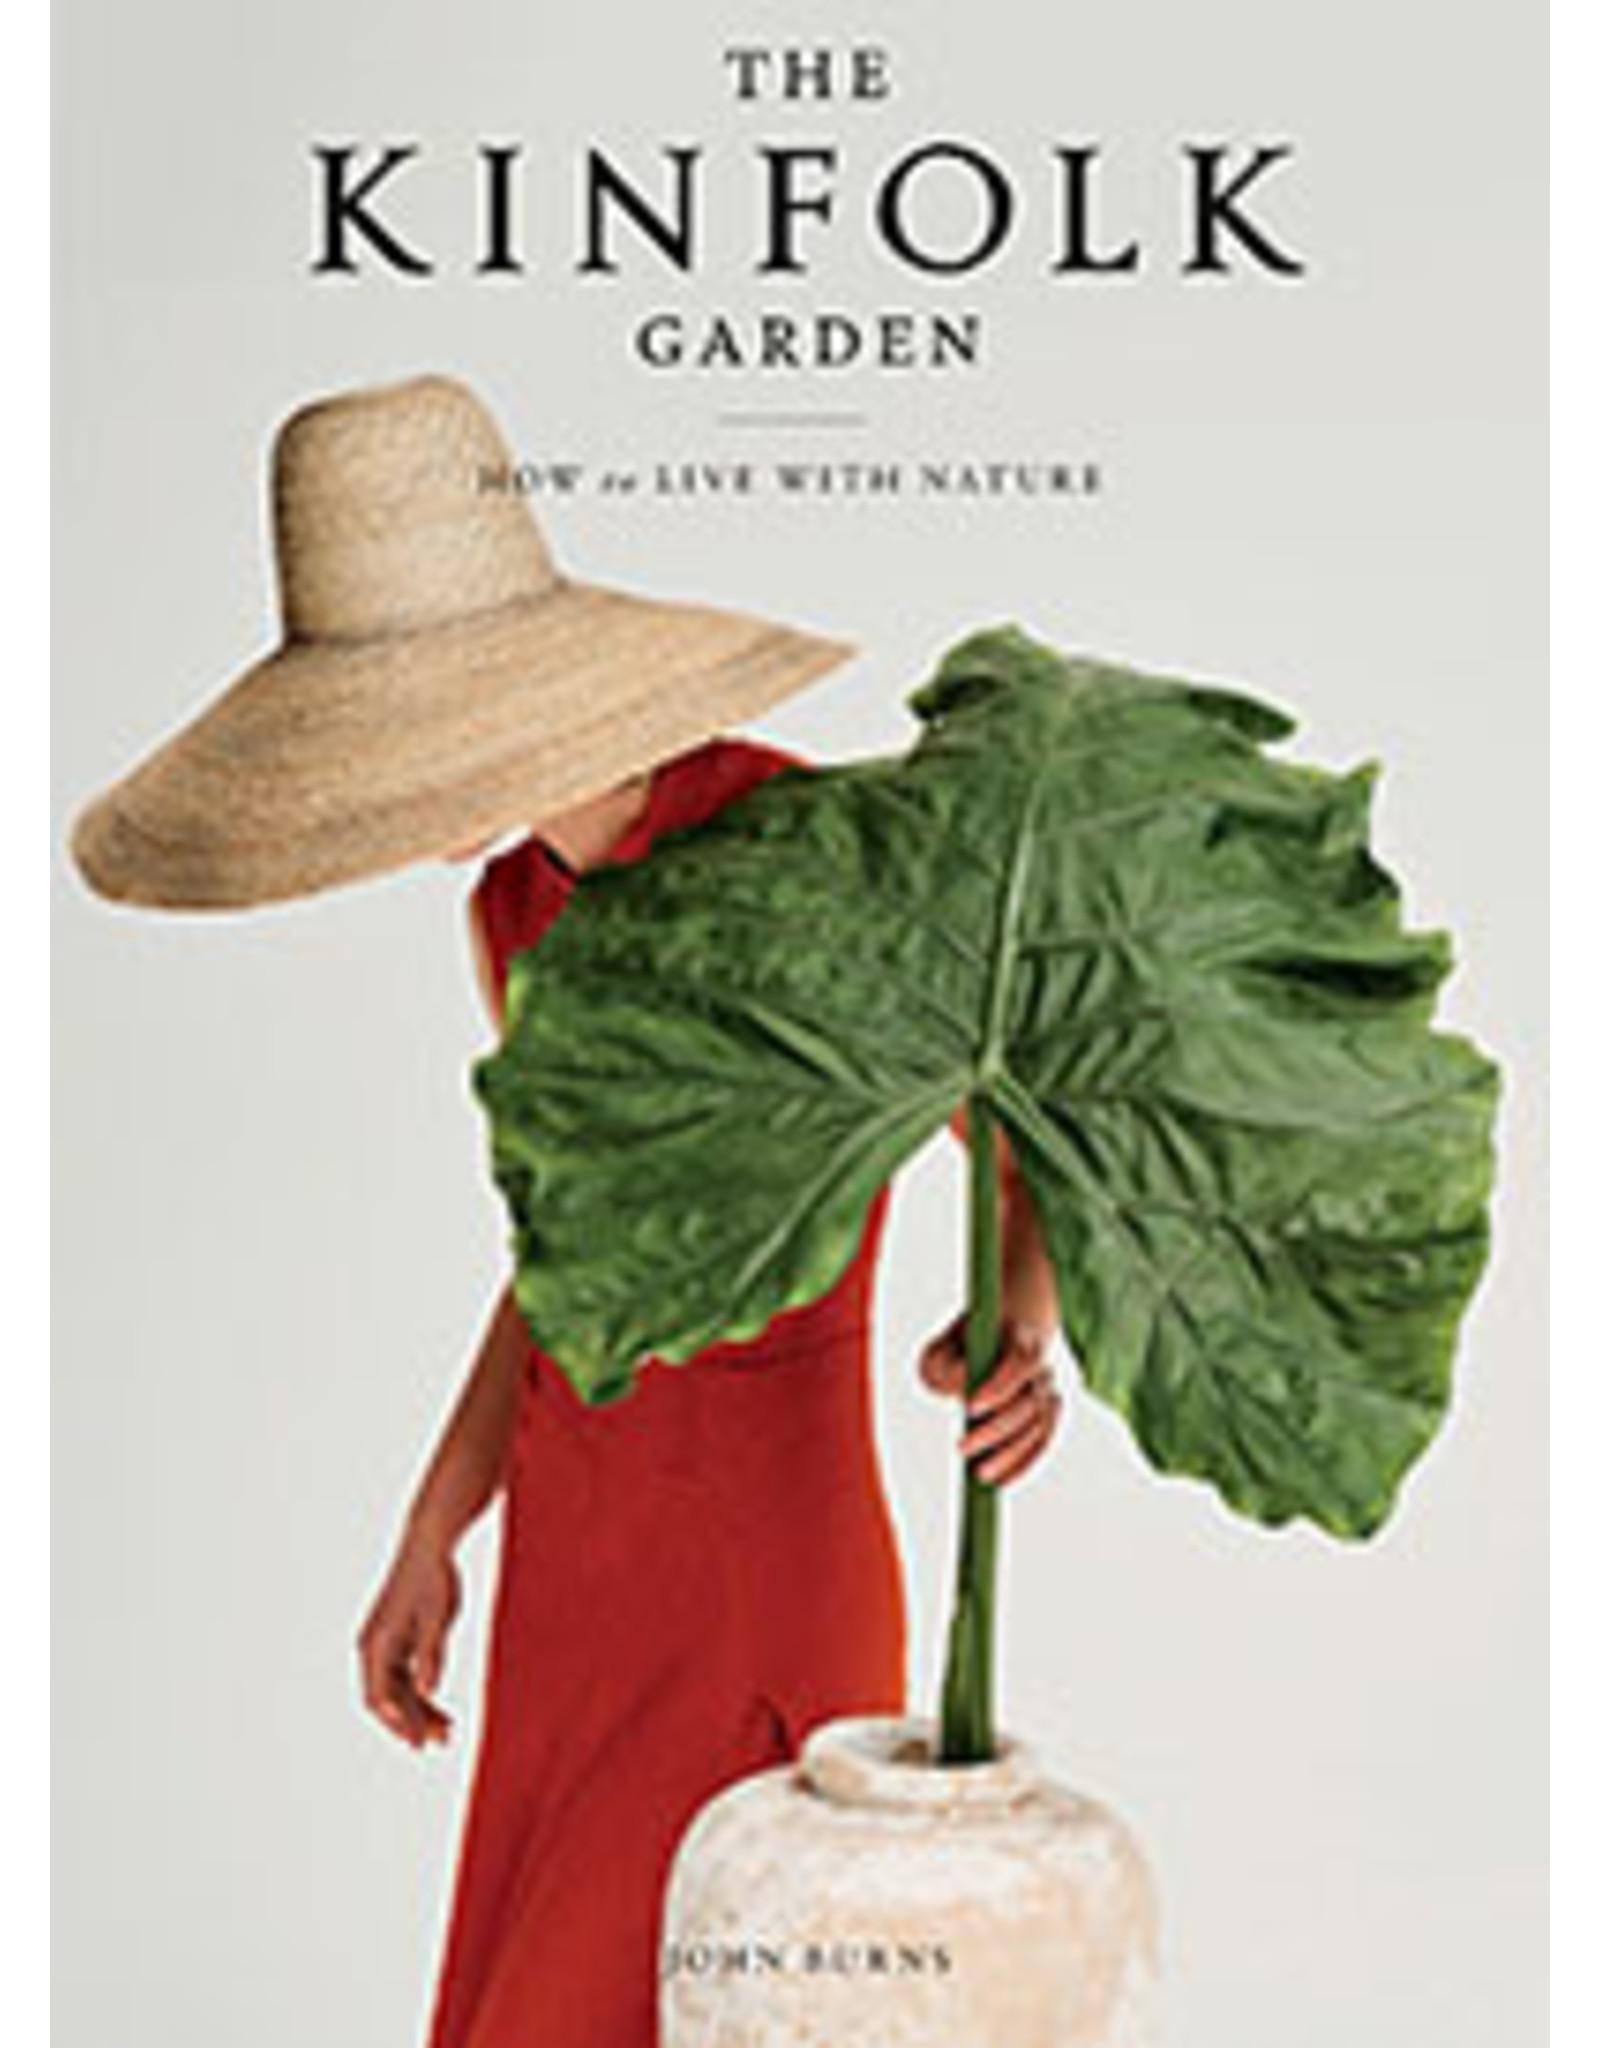 Website The Kinfolk Garden